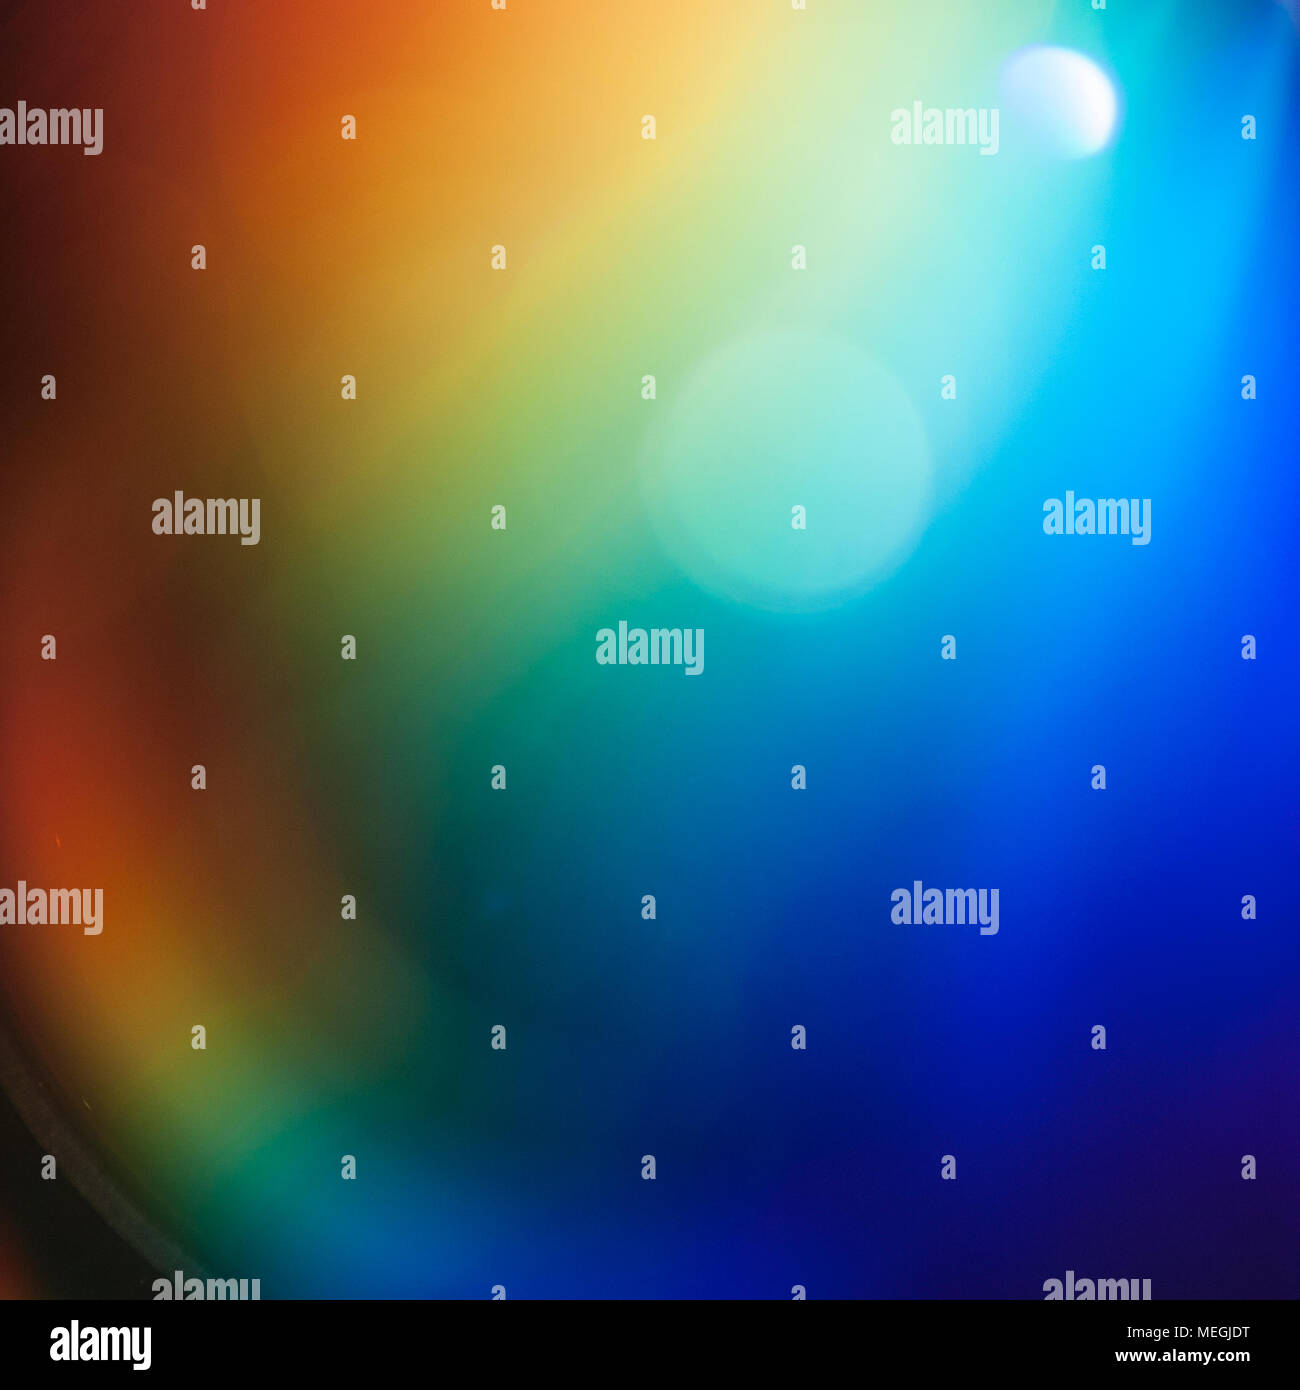 Light Spectrum Abstract - Stock Image